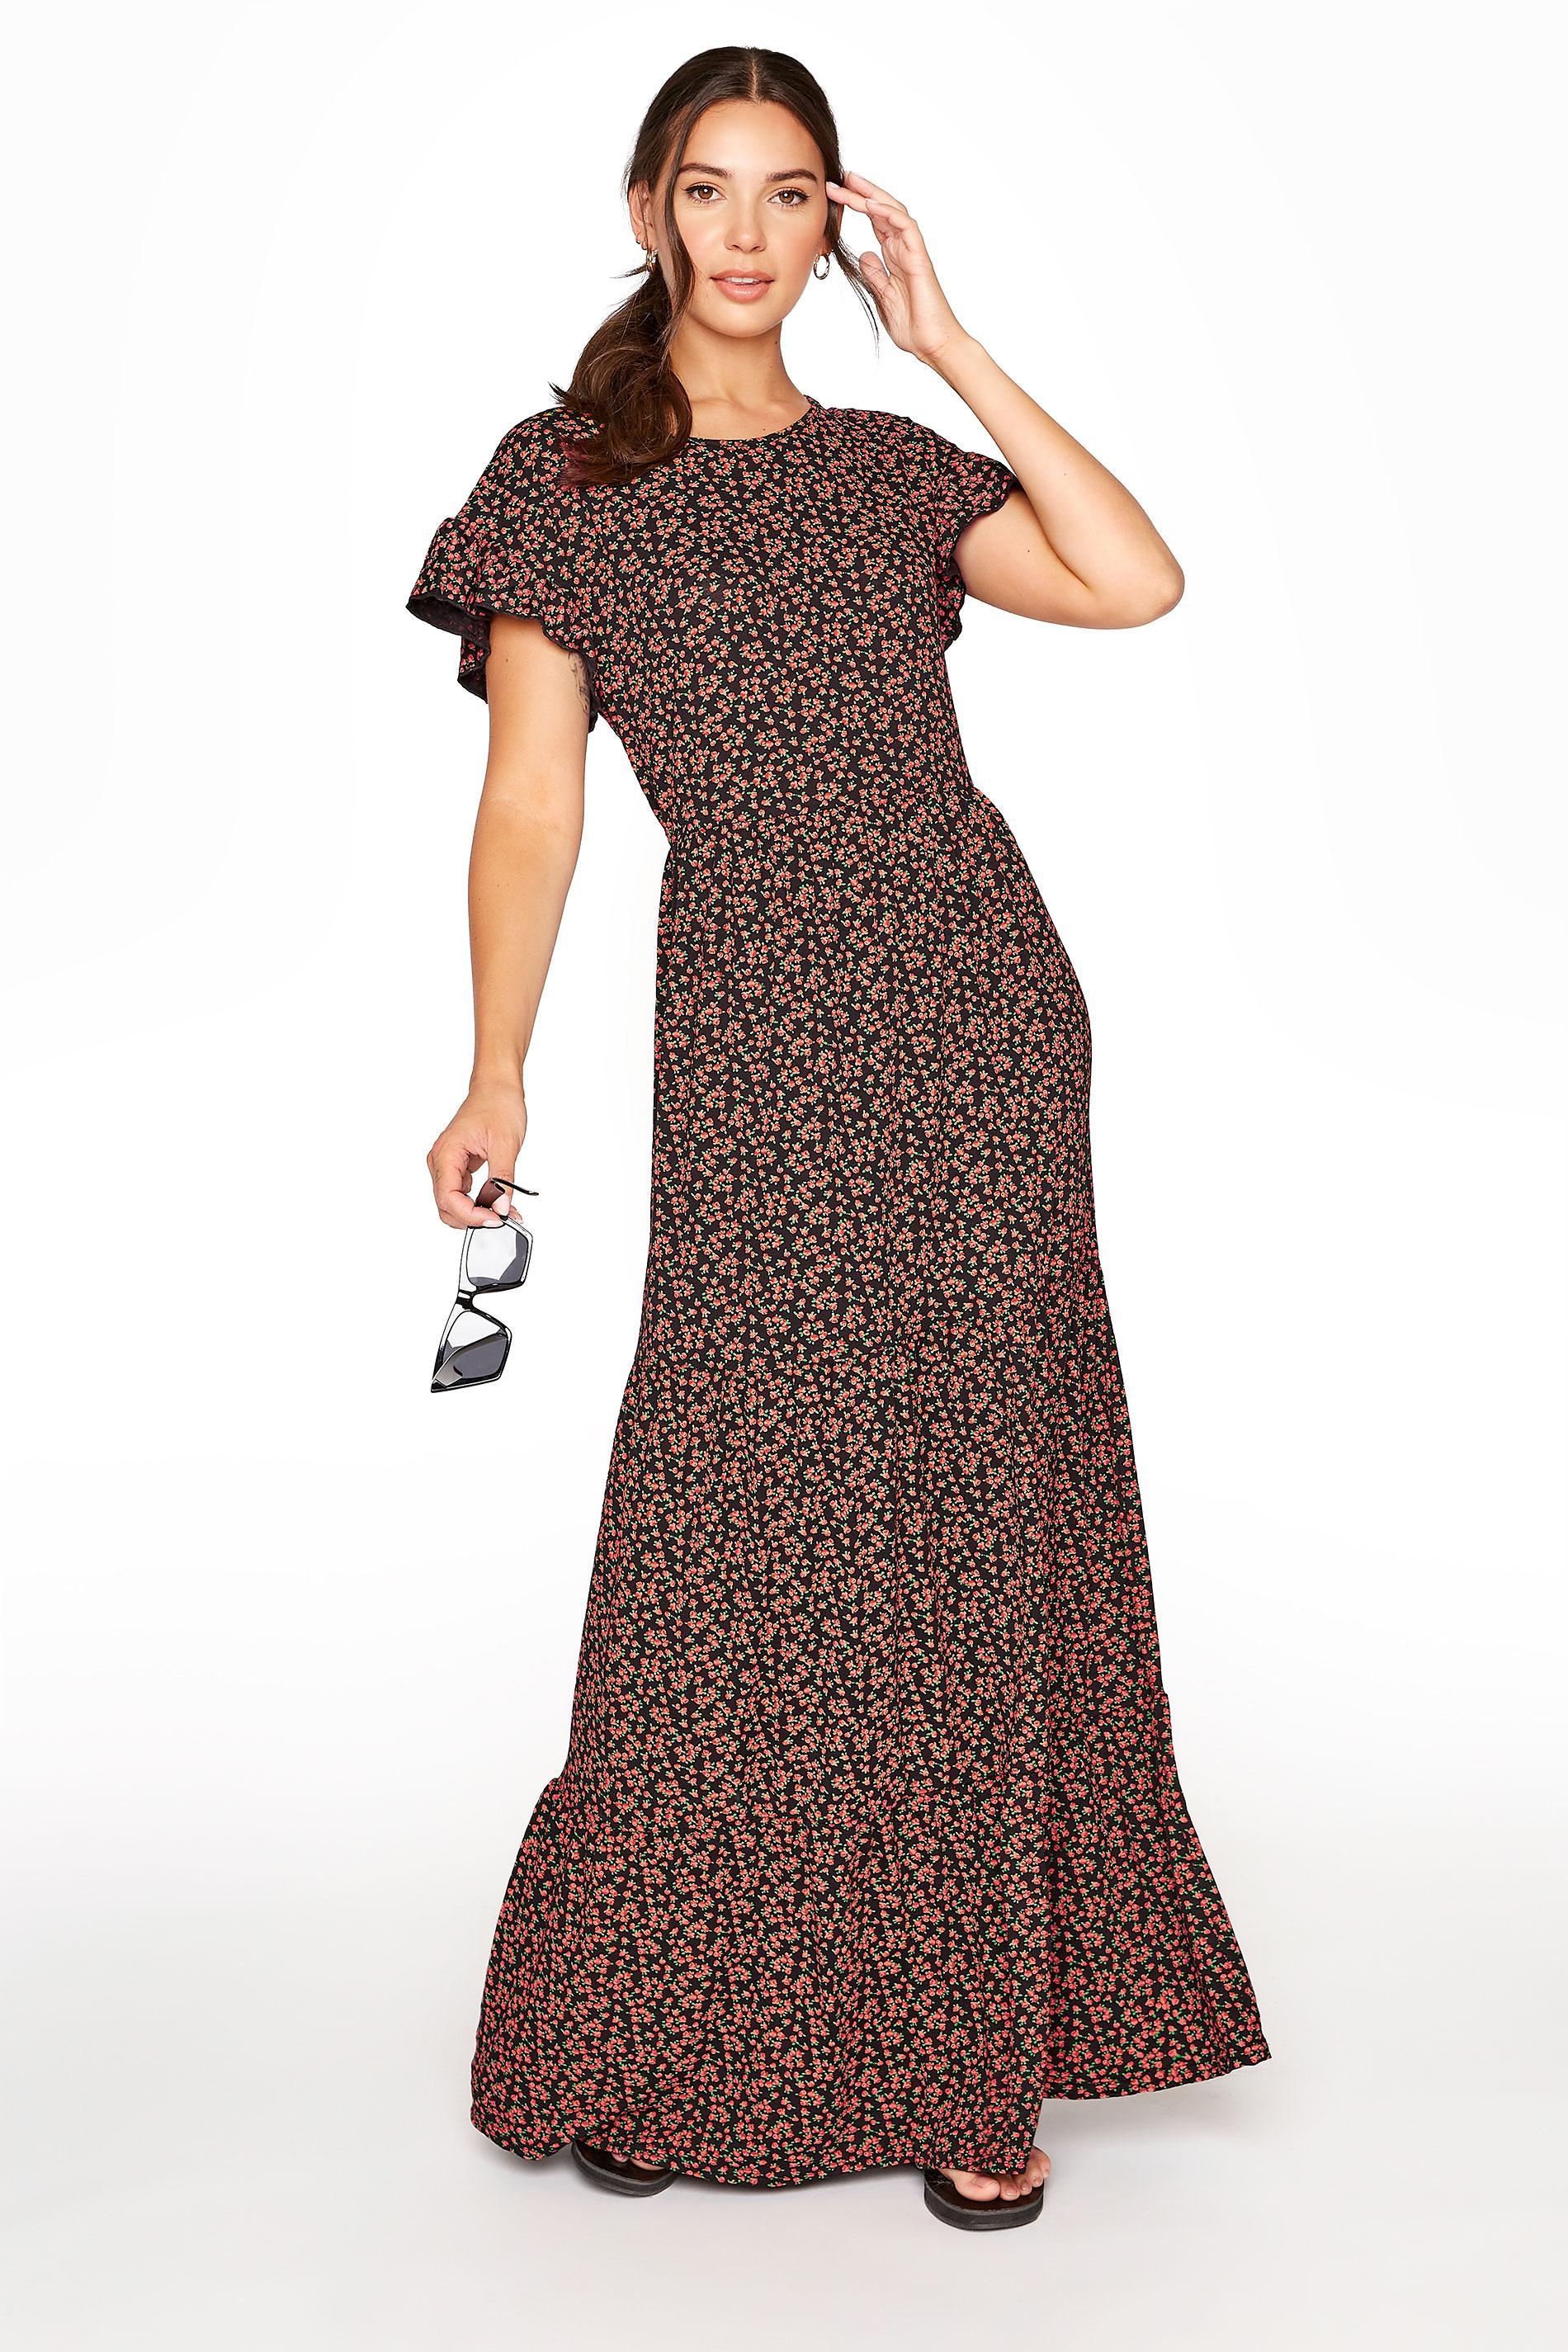 LTS Black Floral Tiered Midaxi Dress